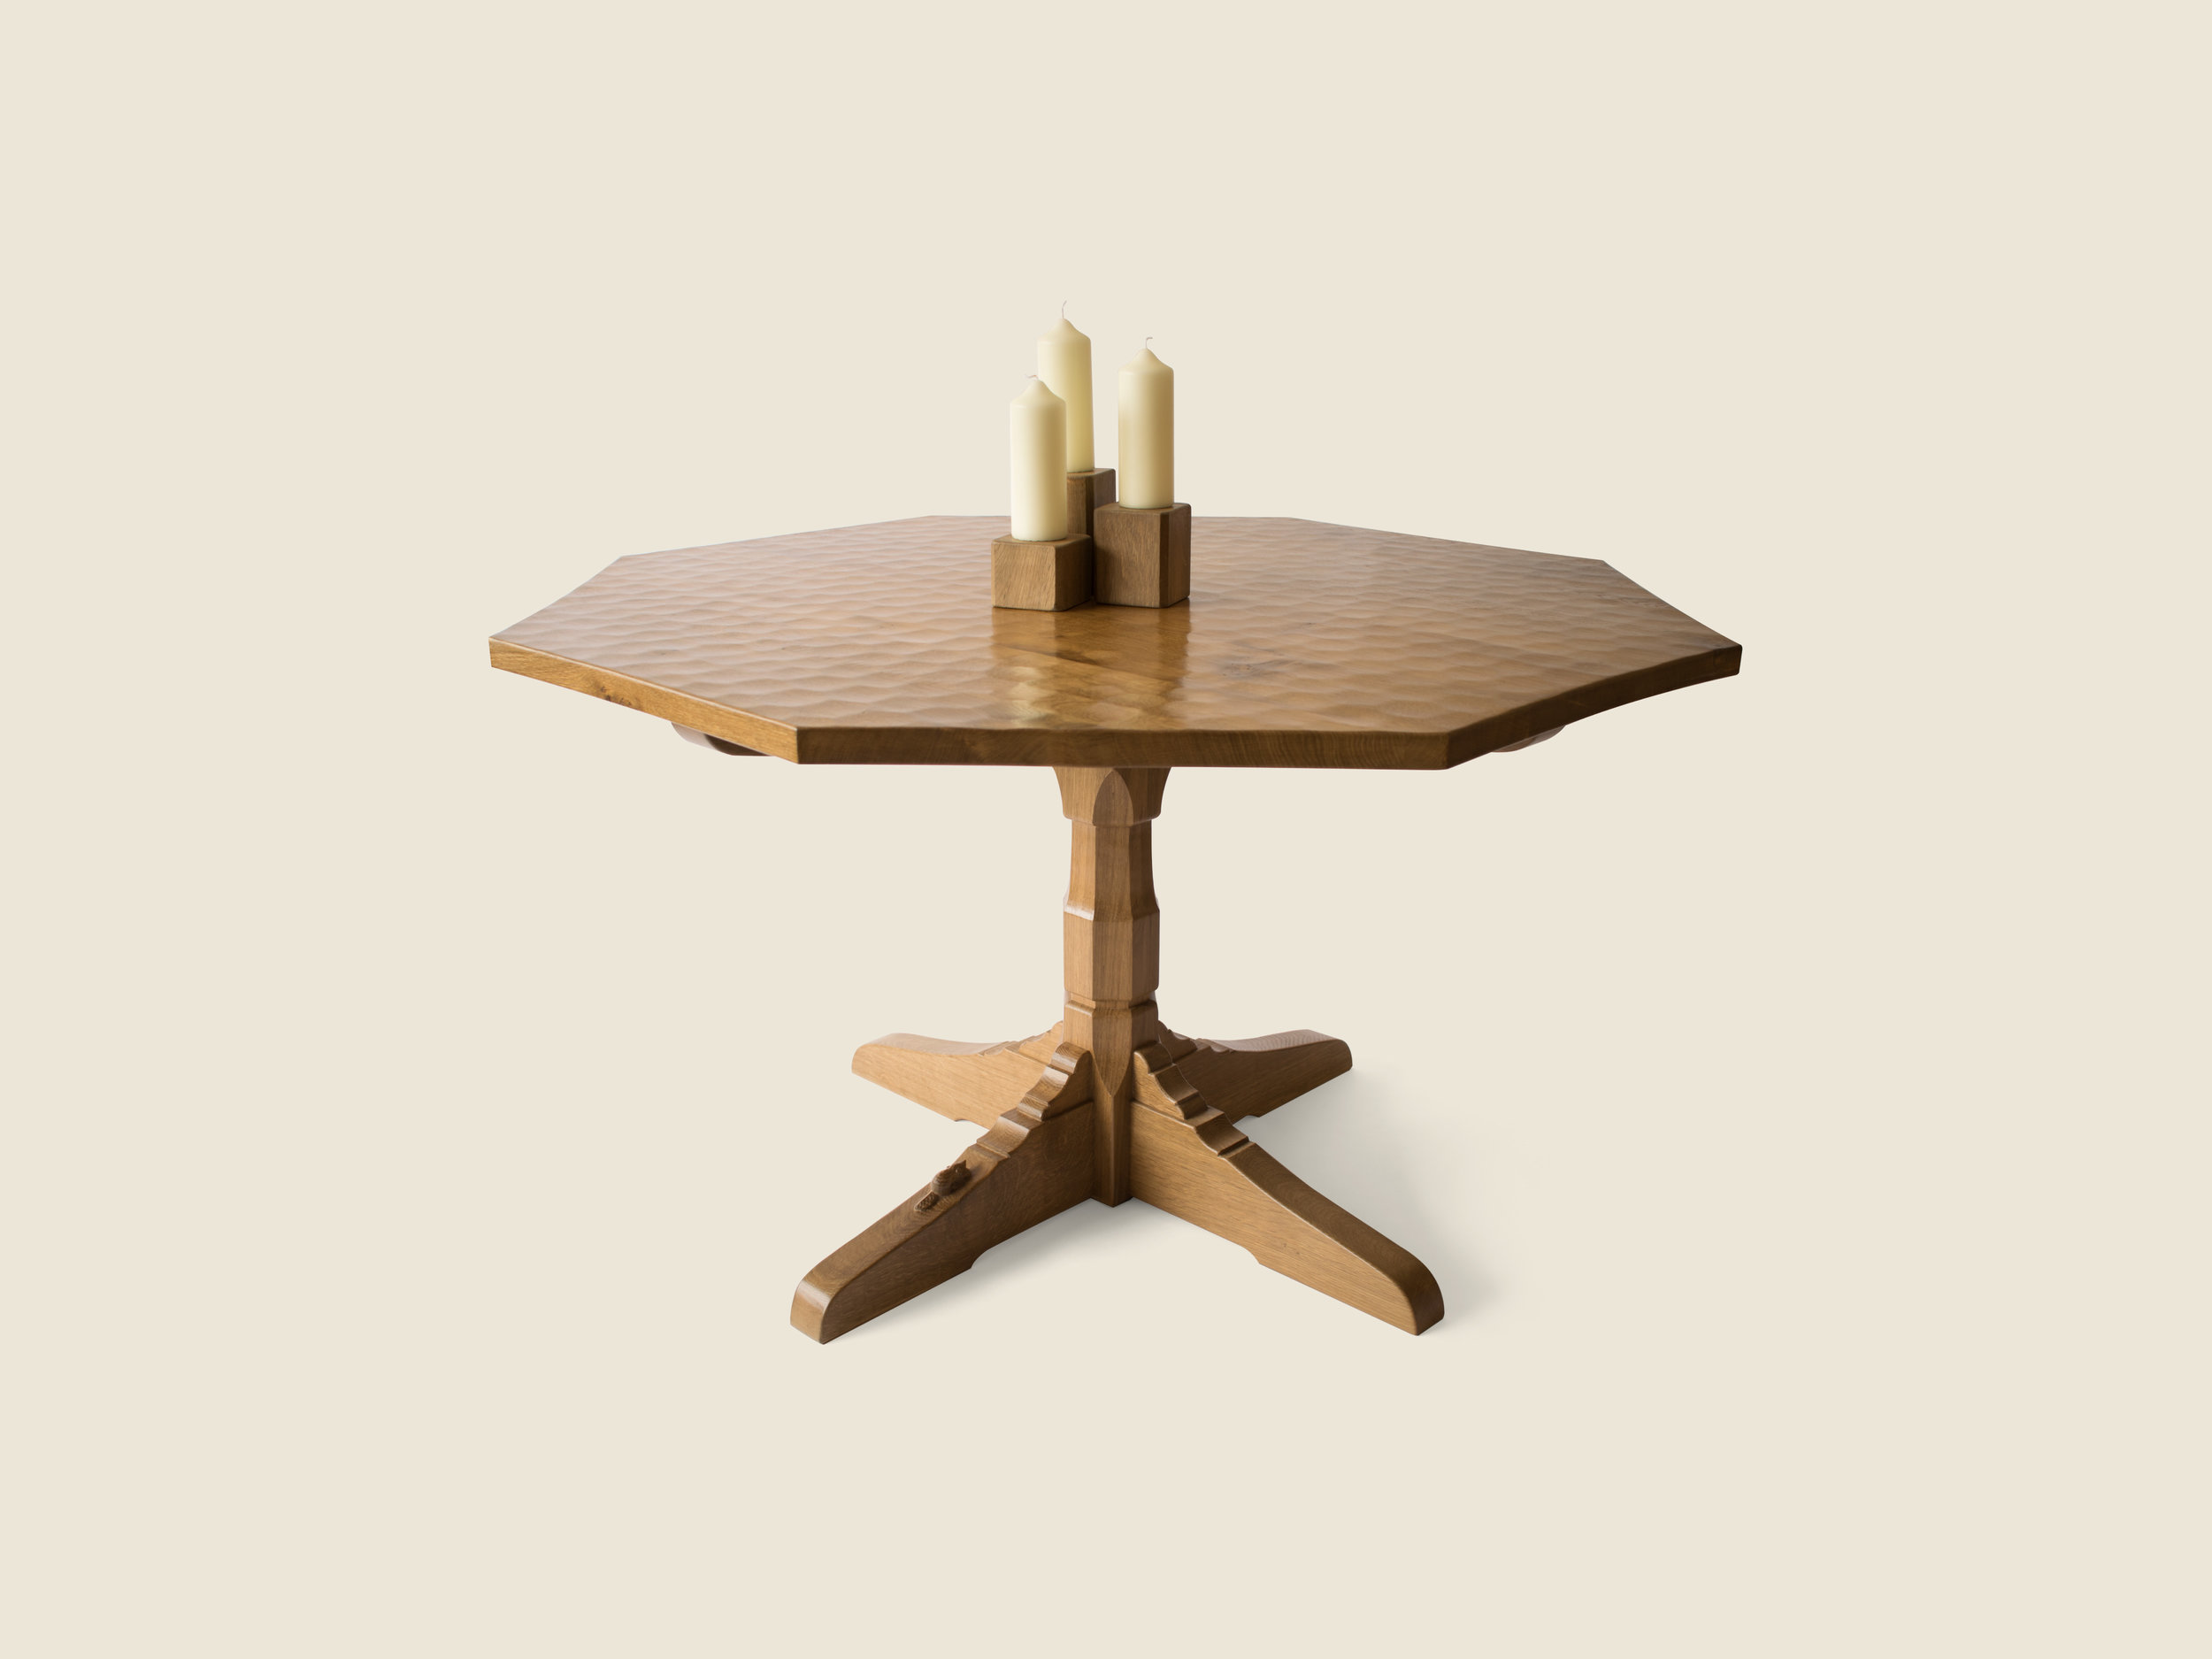 bf111_beaverfurniture_bespoke_octagonal_oak_dining_table_mouseman_style.jpg